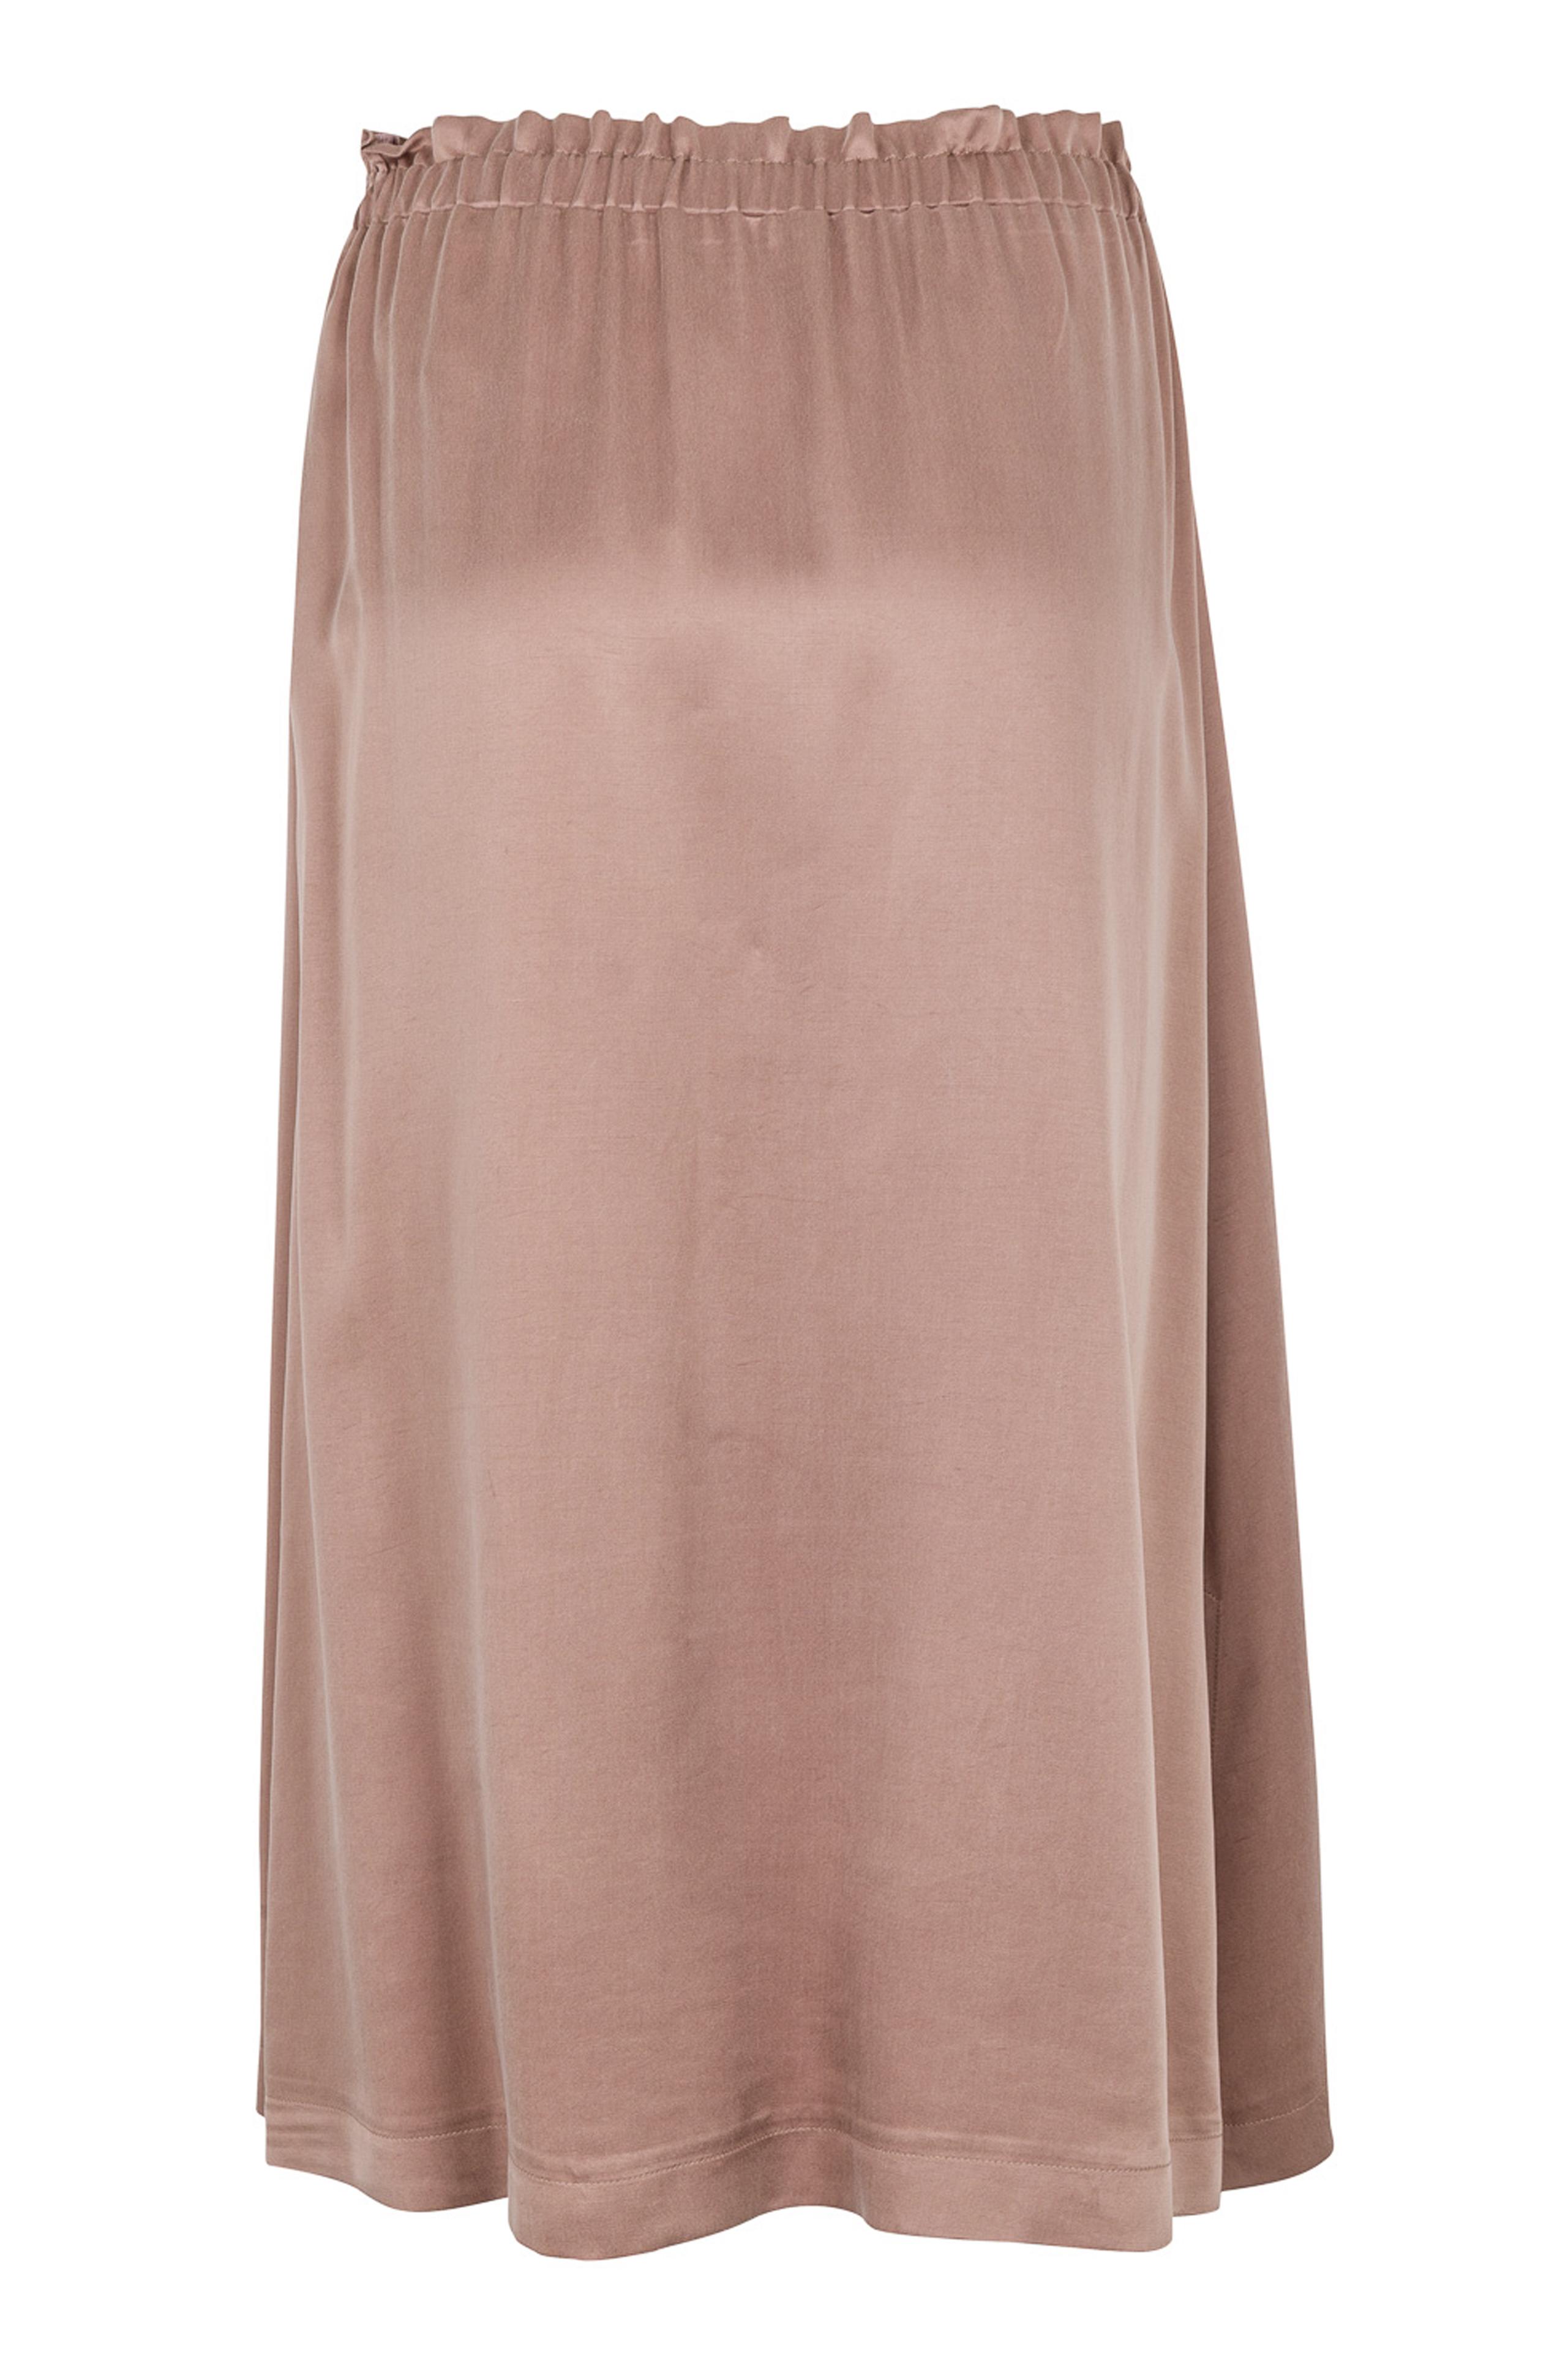 katy skirt, taupe, damen - suite 13